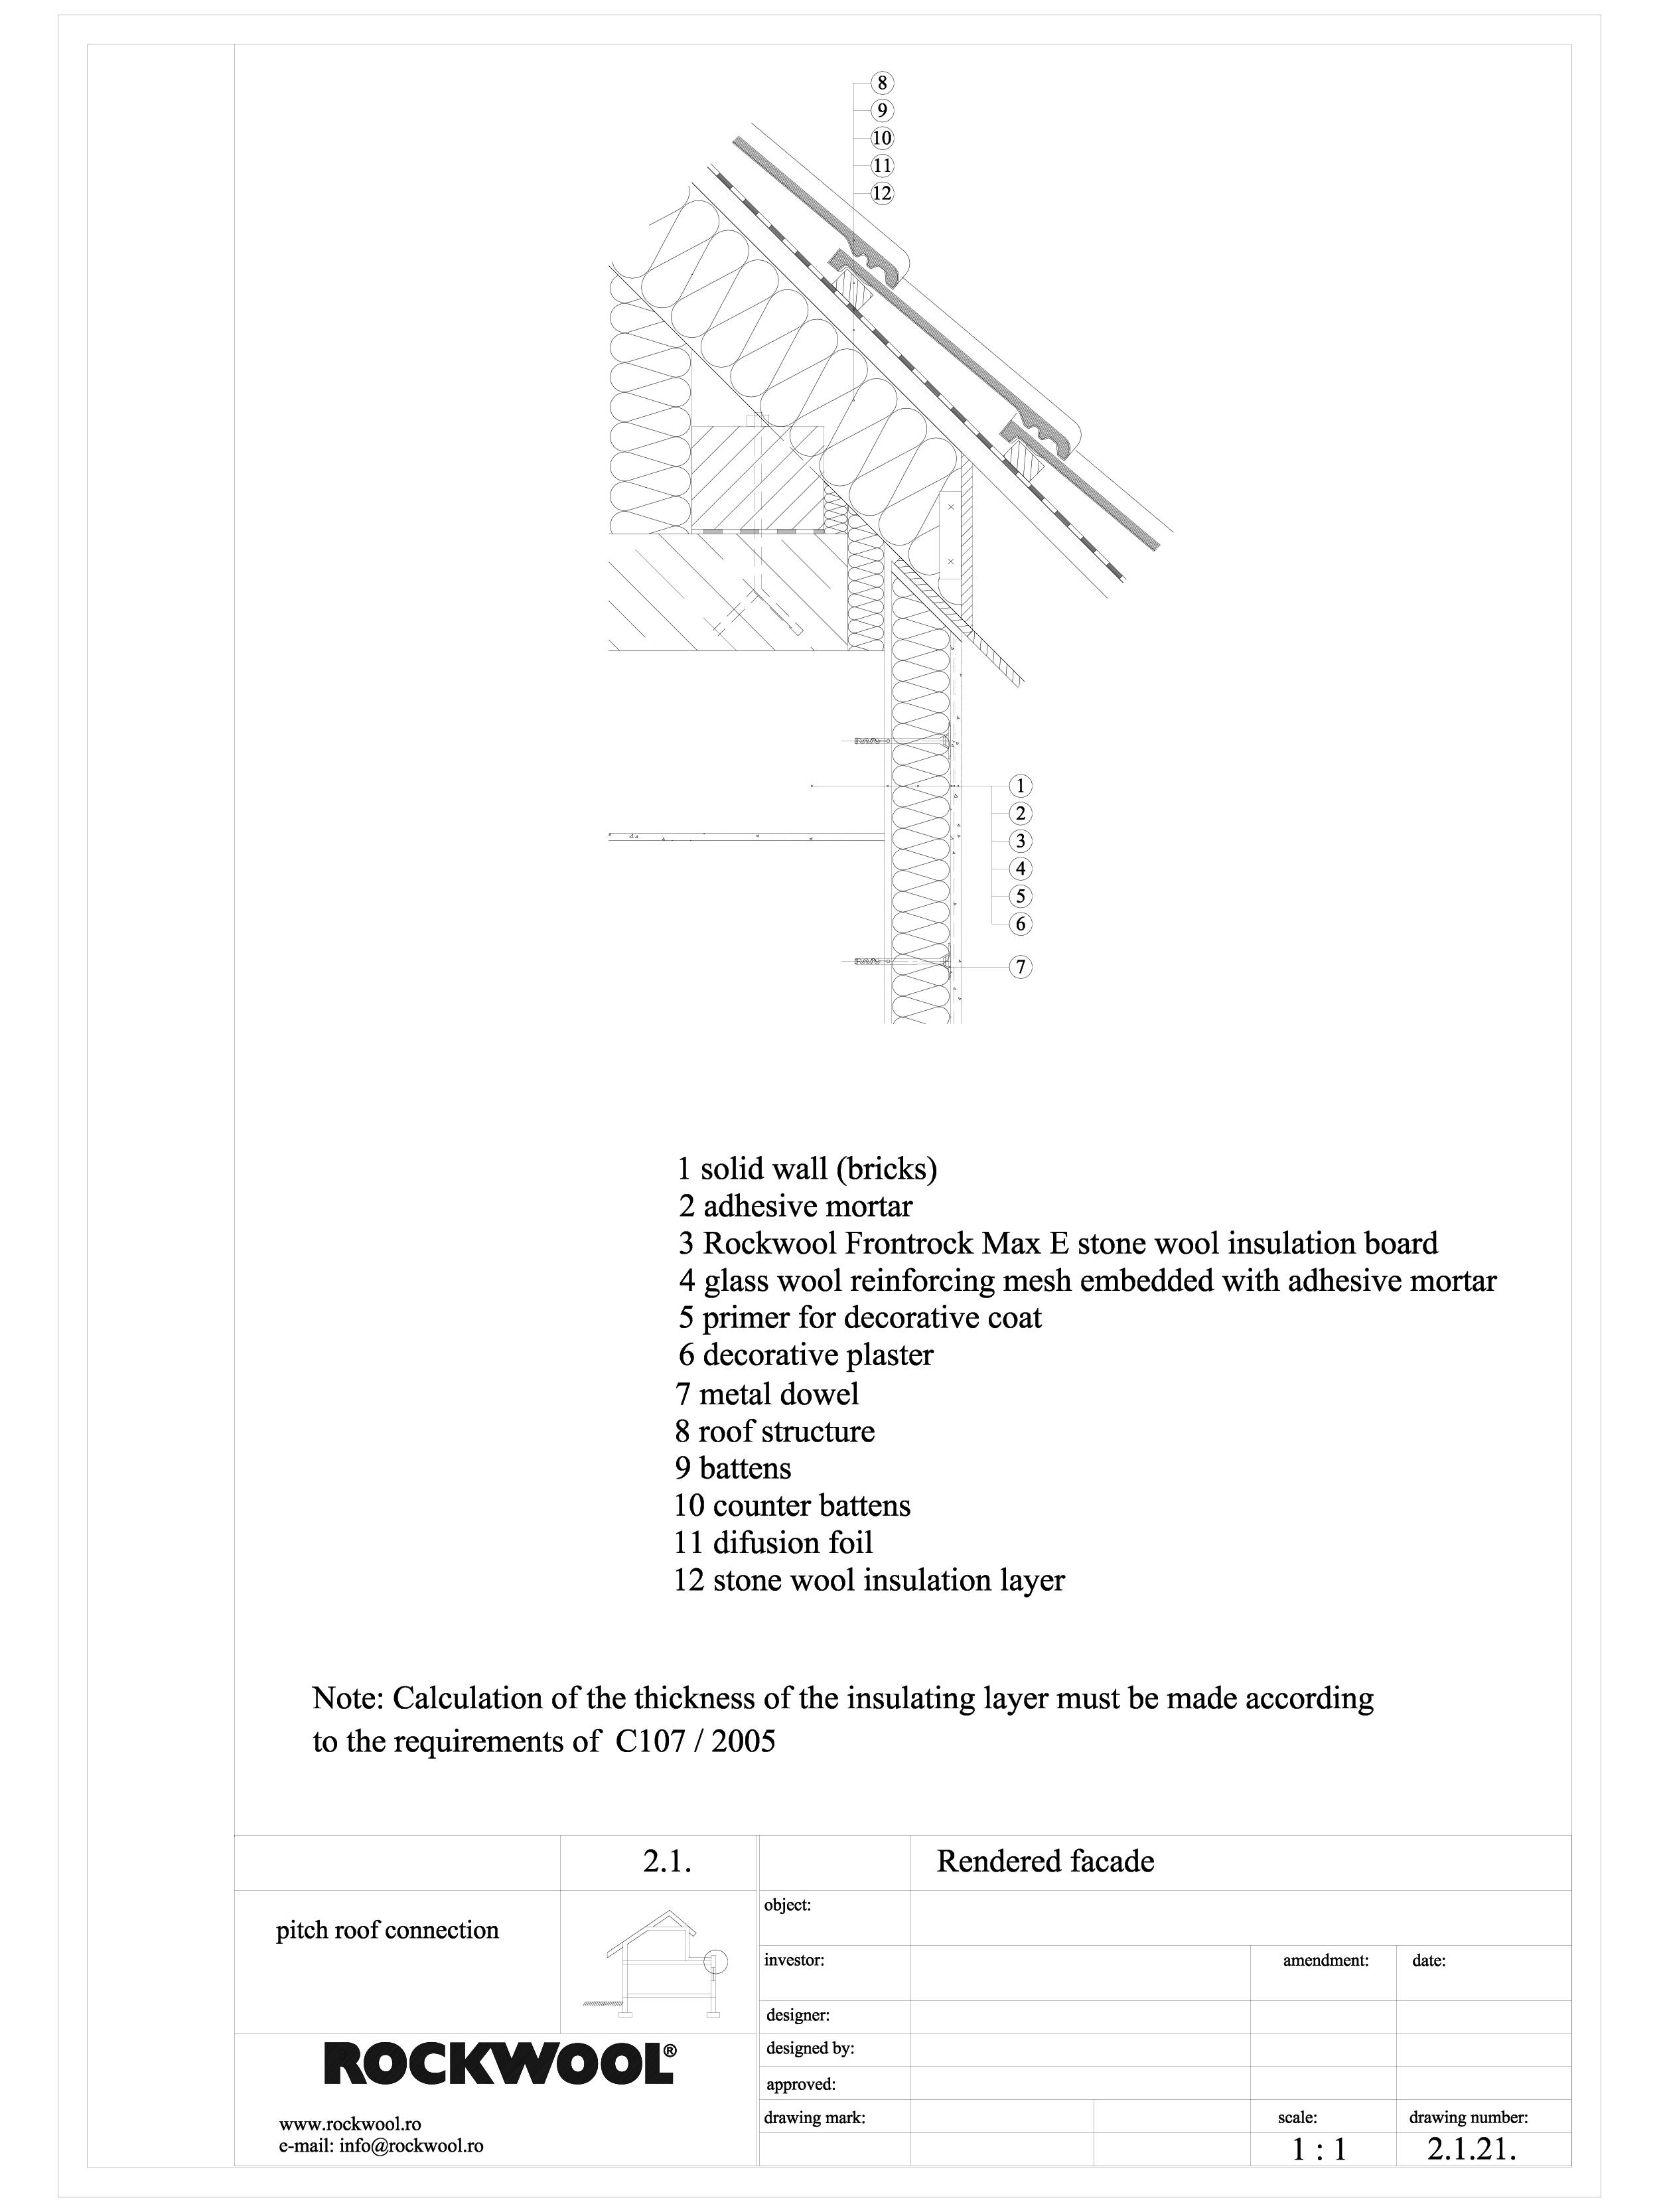 Termoizolarea fatadelor tencuite - detaliu racord la streasina ROCKWOOL Termoizolatie vata bazaltica pentru fatade ventilate ROCKWOOL ROMANIA  - Pagina 1